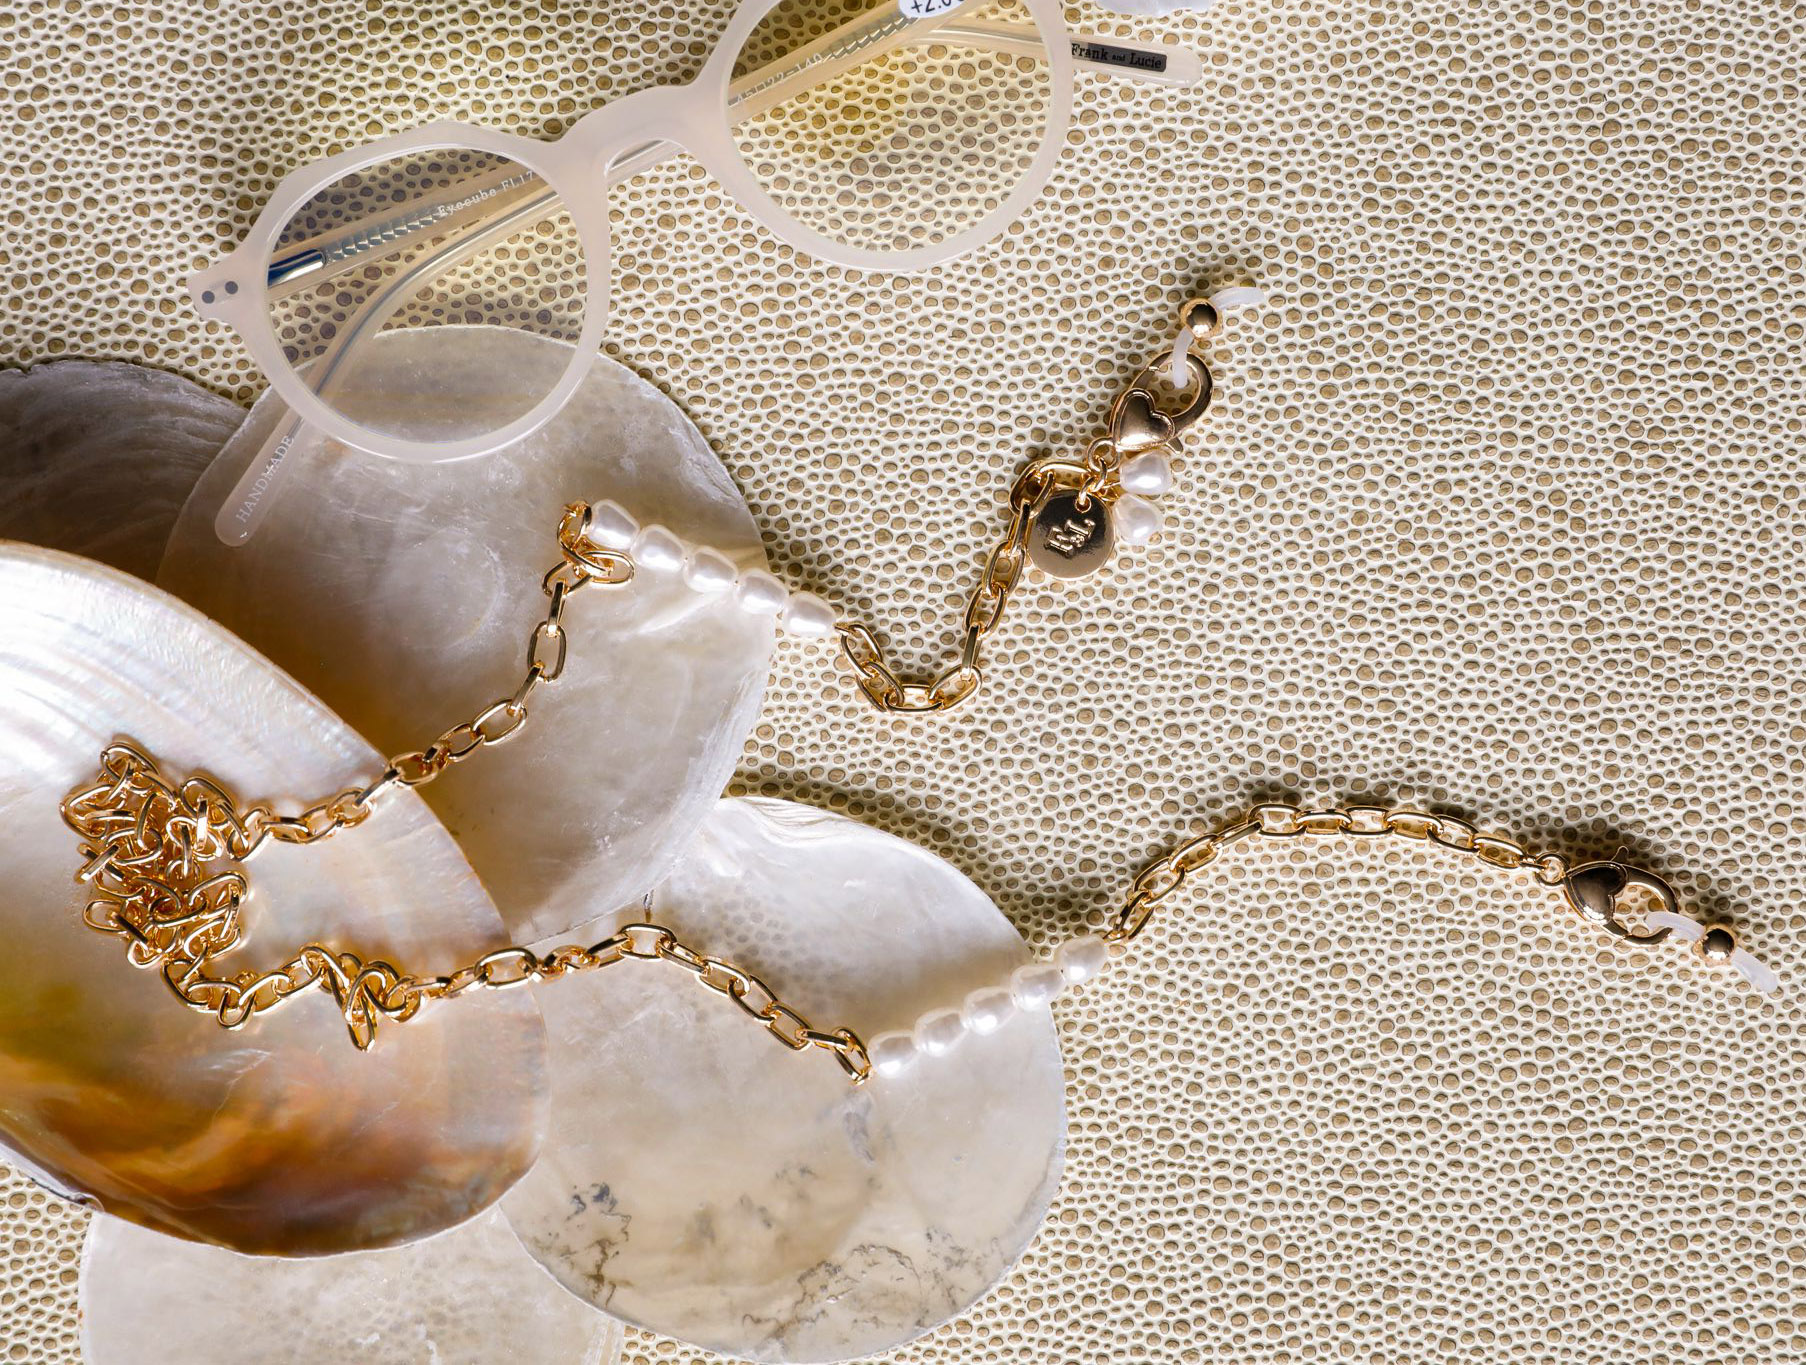 frank and lucie ss 2021 summer bliss eyewear chain soleil blanc eyecube white sand